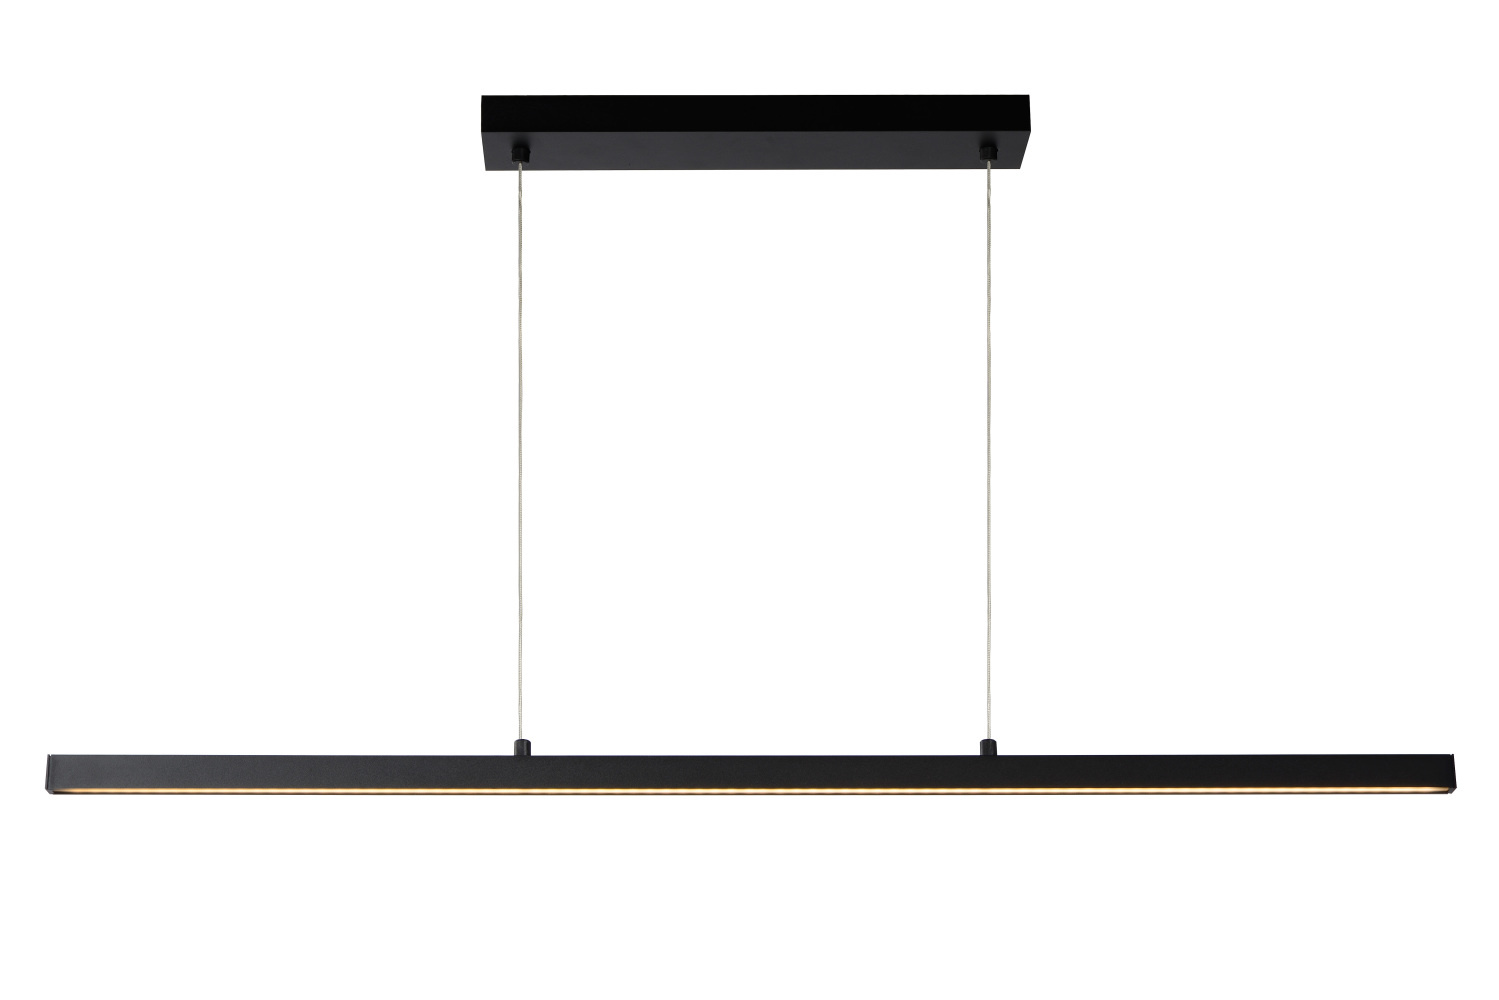 Lucide SIGMA Hanglamp-Zwart-LED Dimb.-31W-2700K-Alumin.